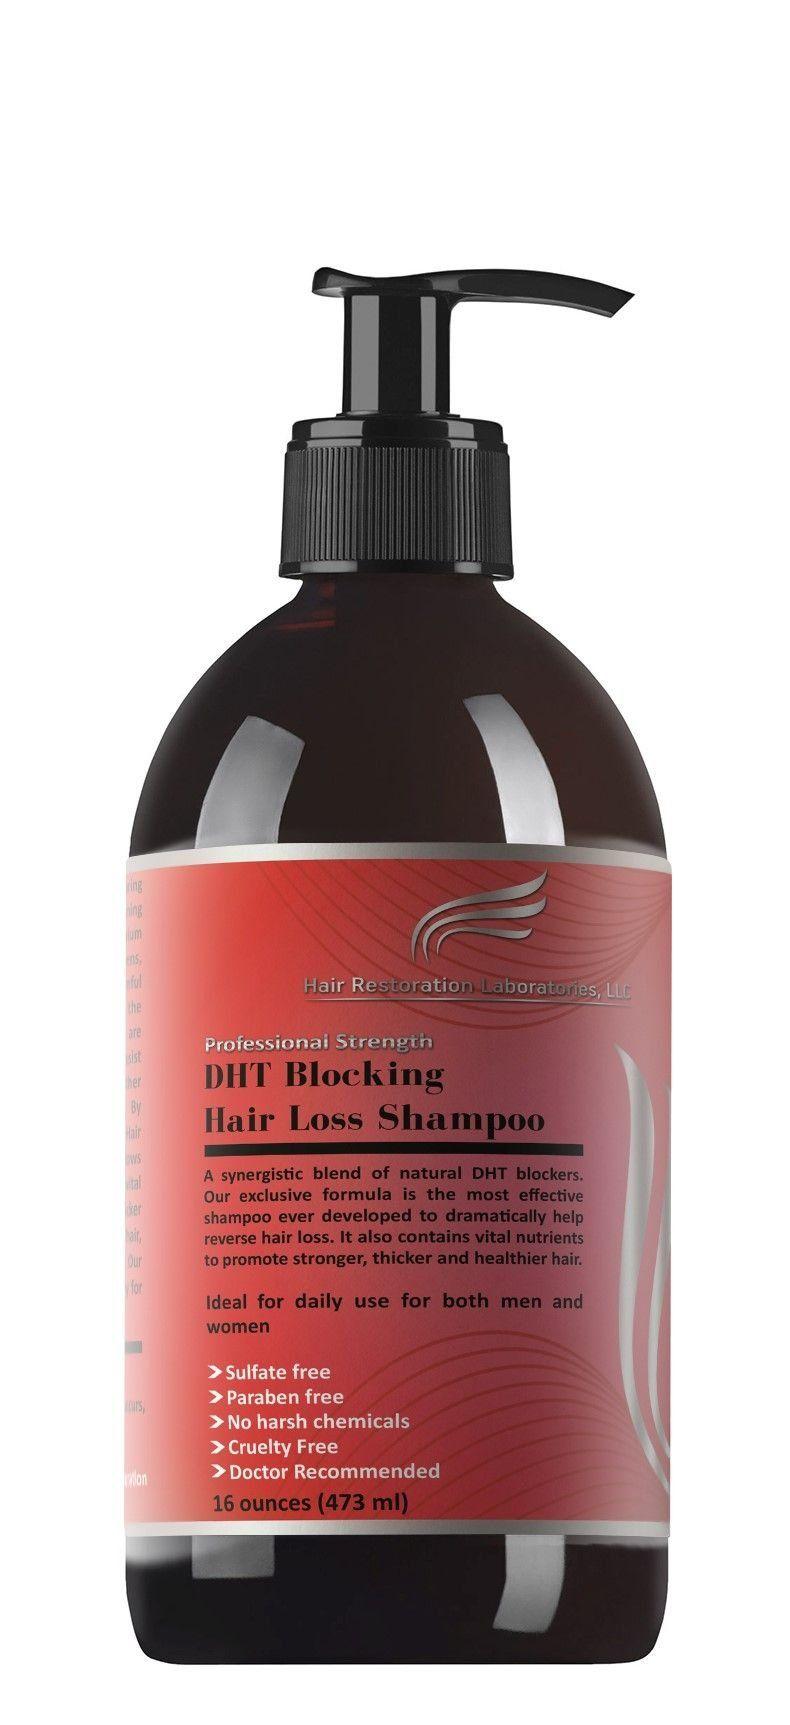 Hair restoration laboratories professional strength dht